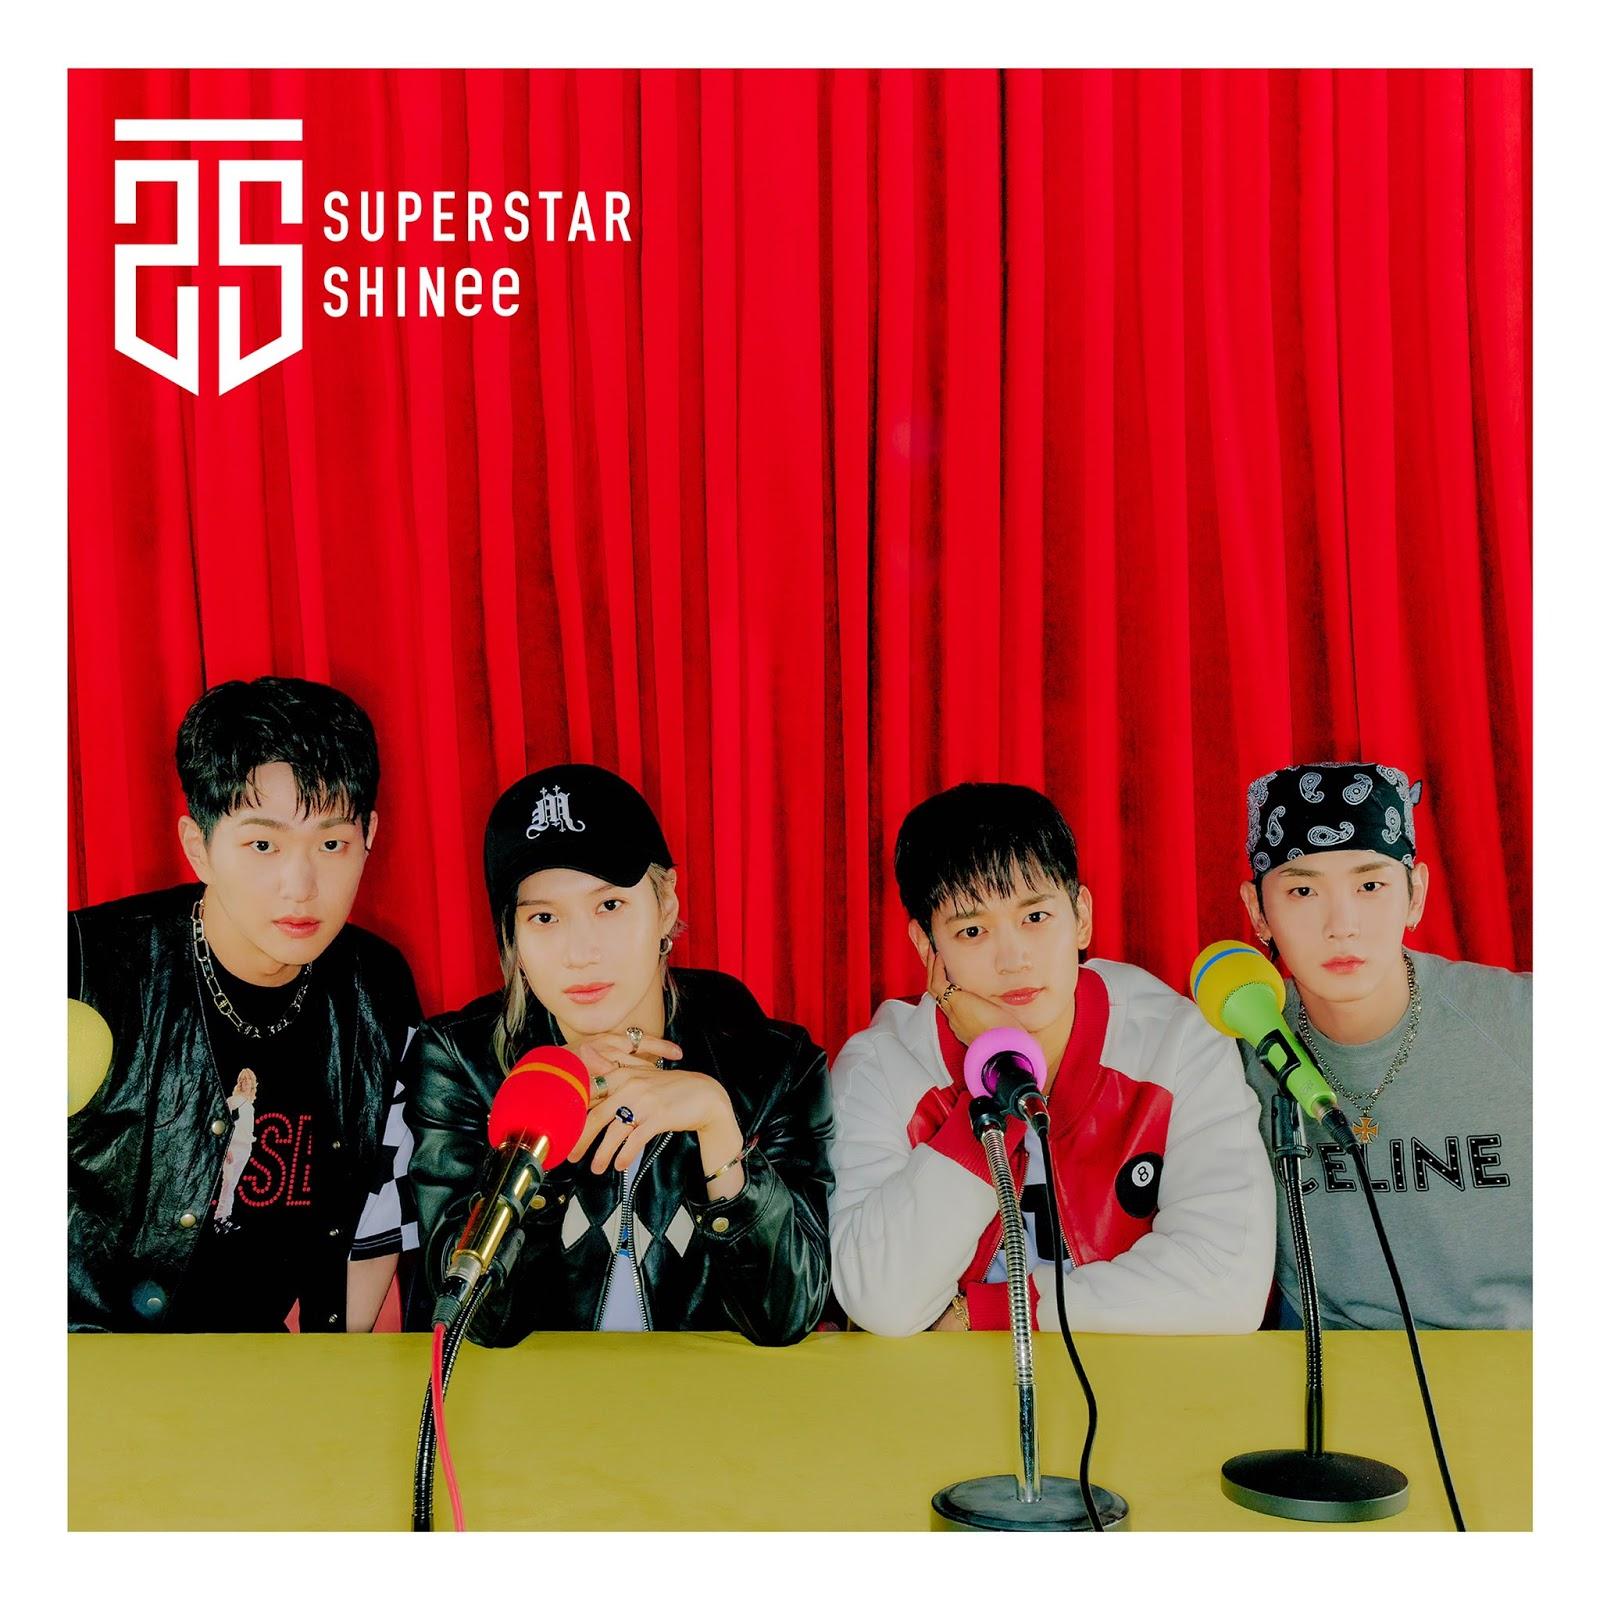 SHINee para SUPERSTAR, trabajo japonés 2021